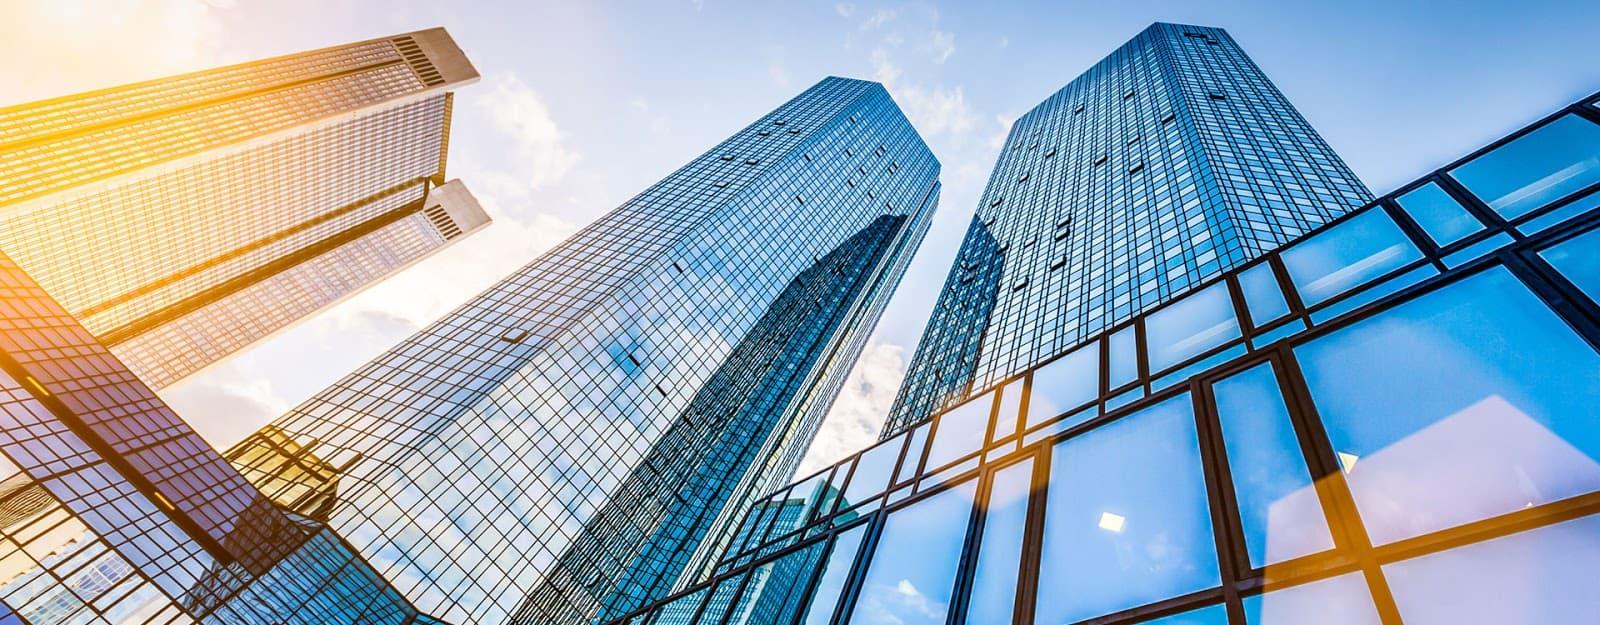 Tax-Efficient Business Structures for Australians